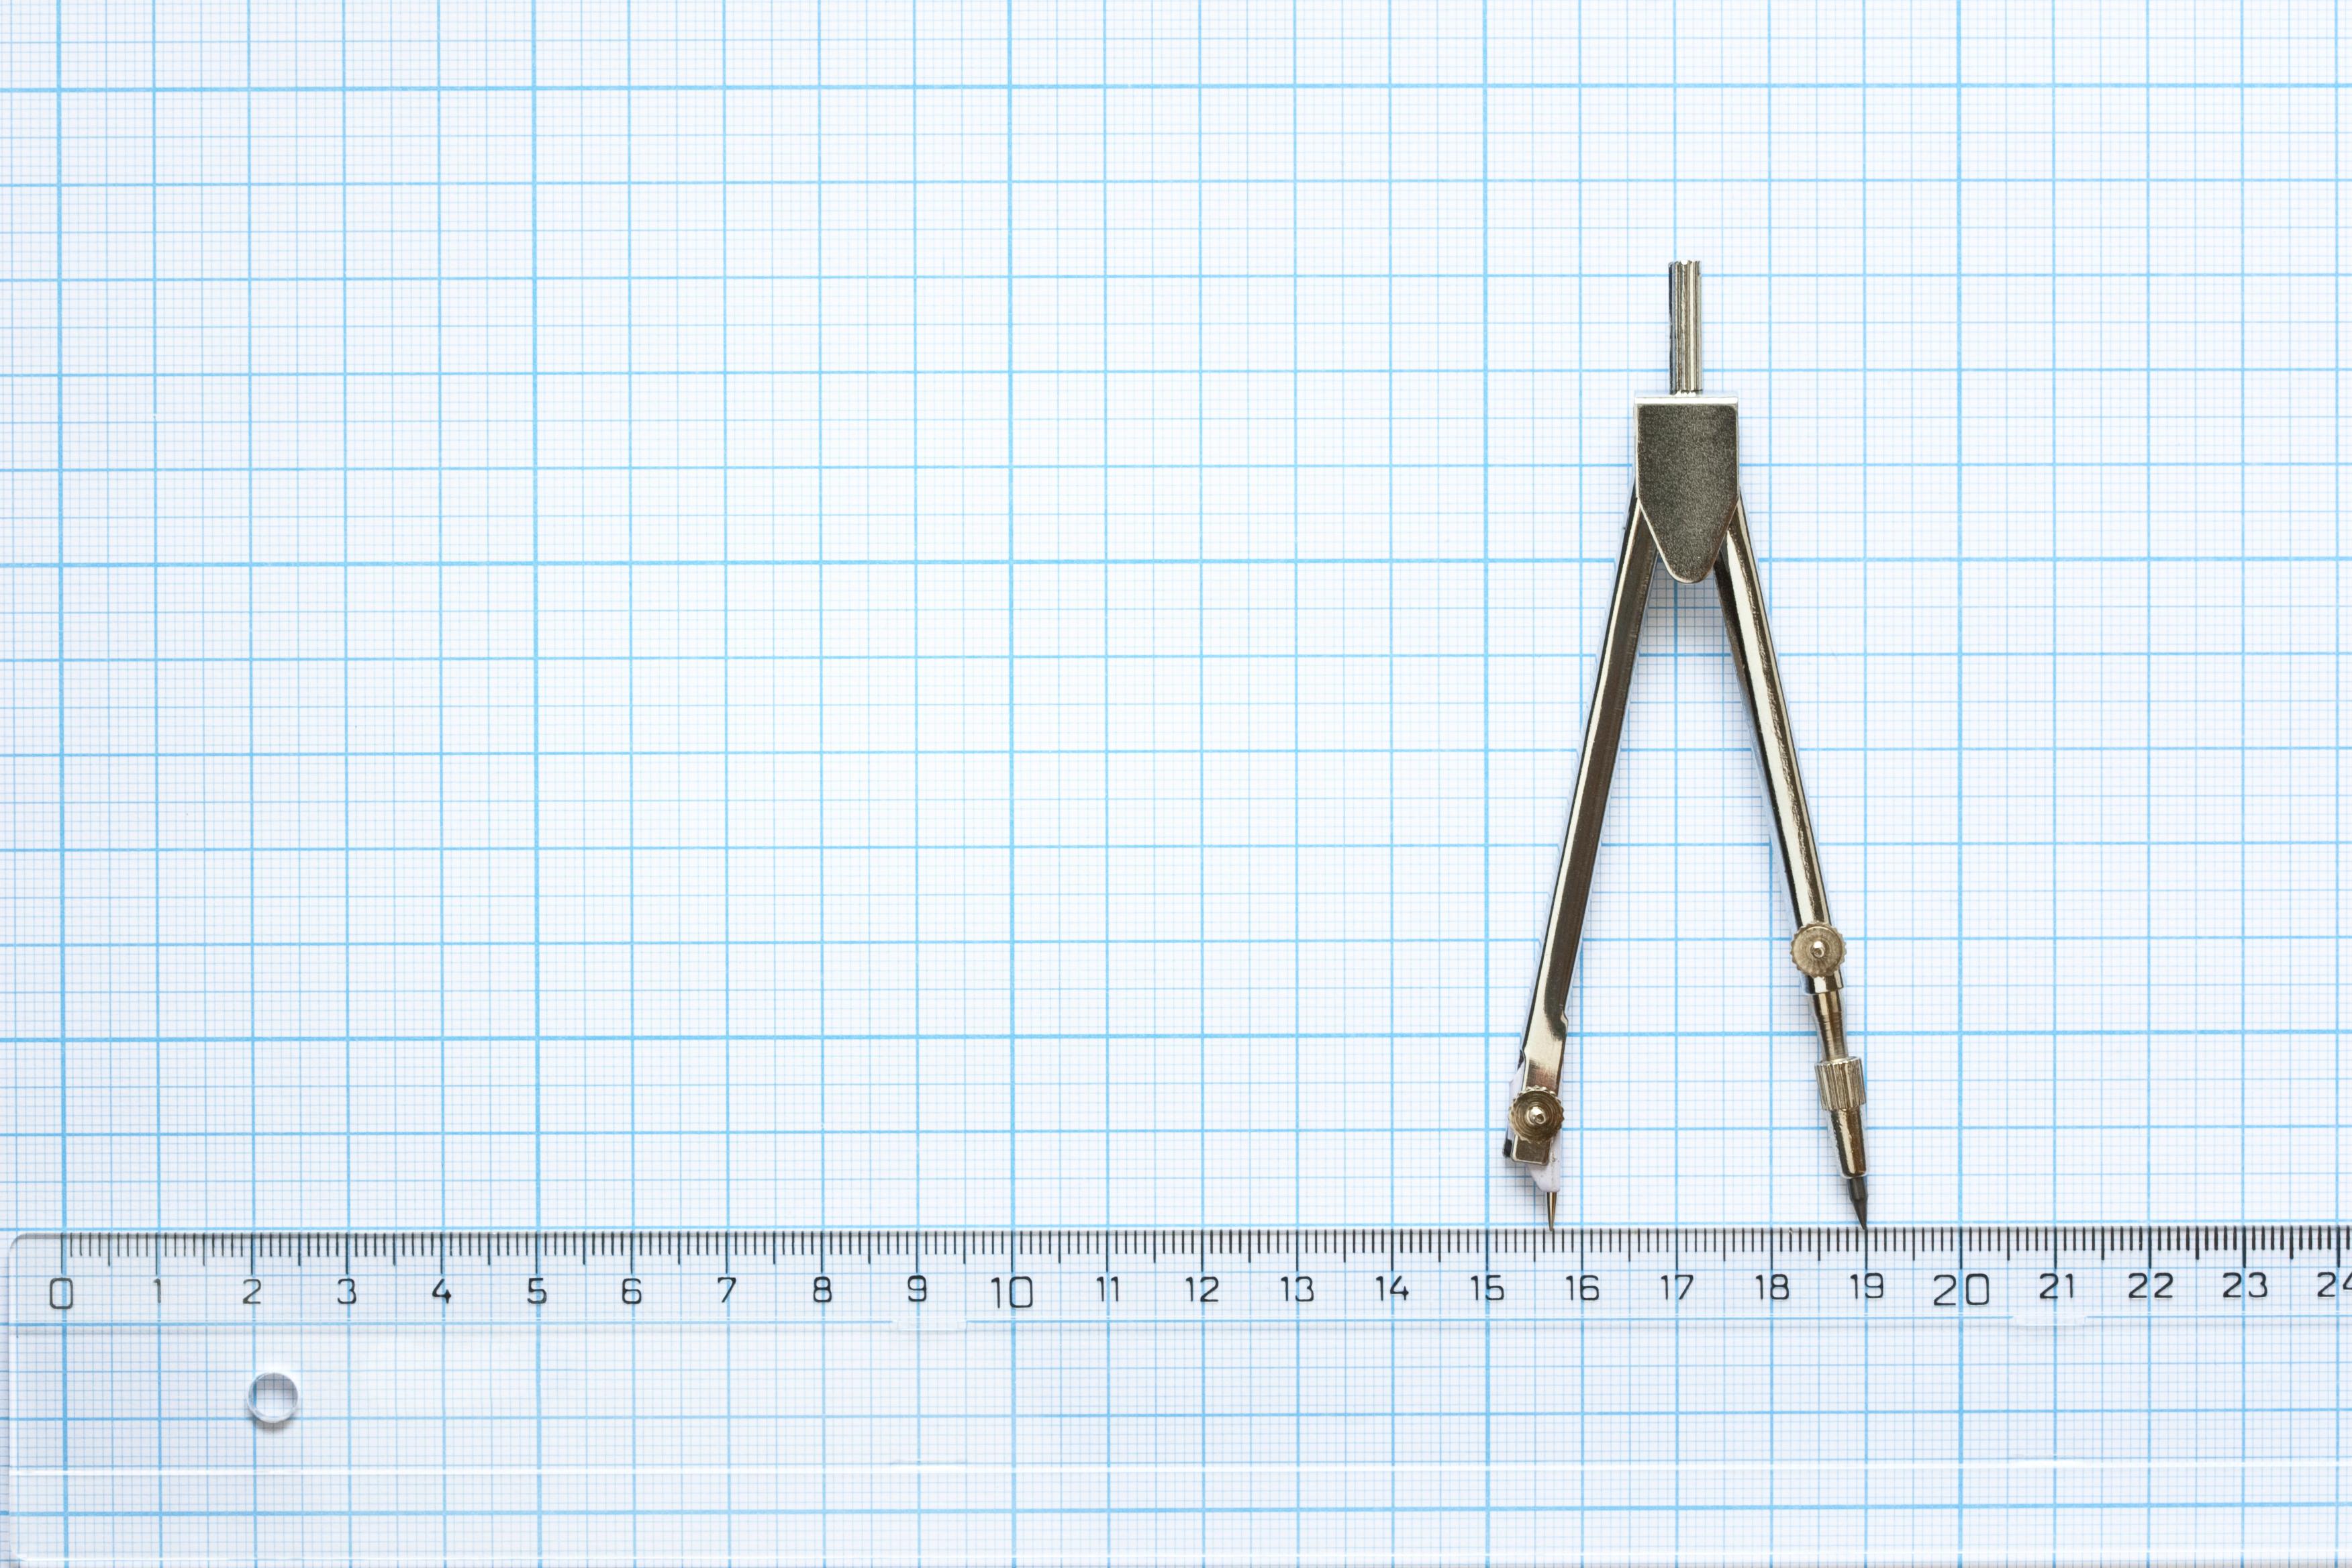 Homemade Surveying Instruments